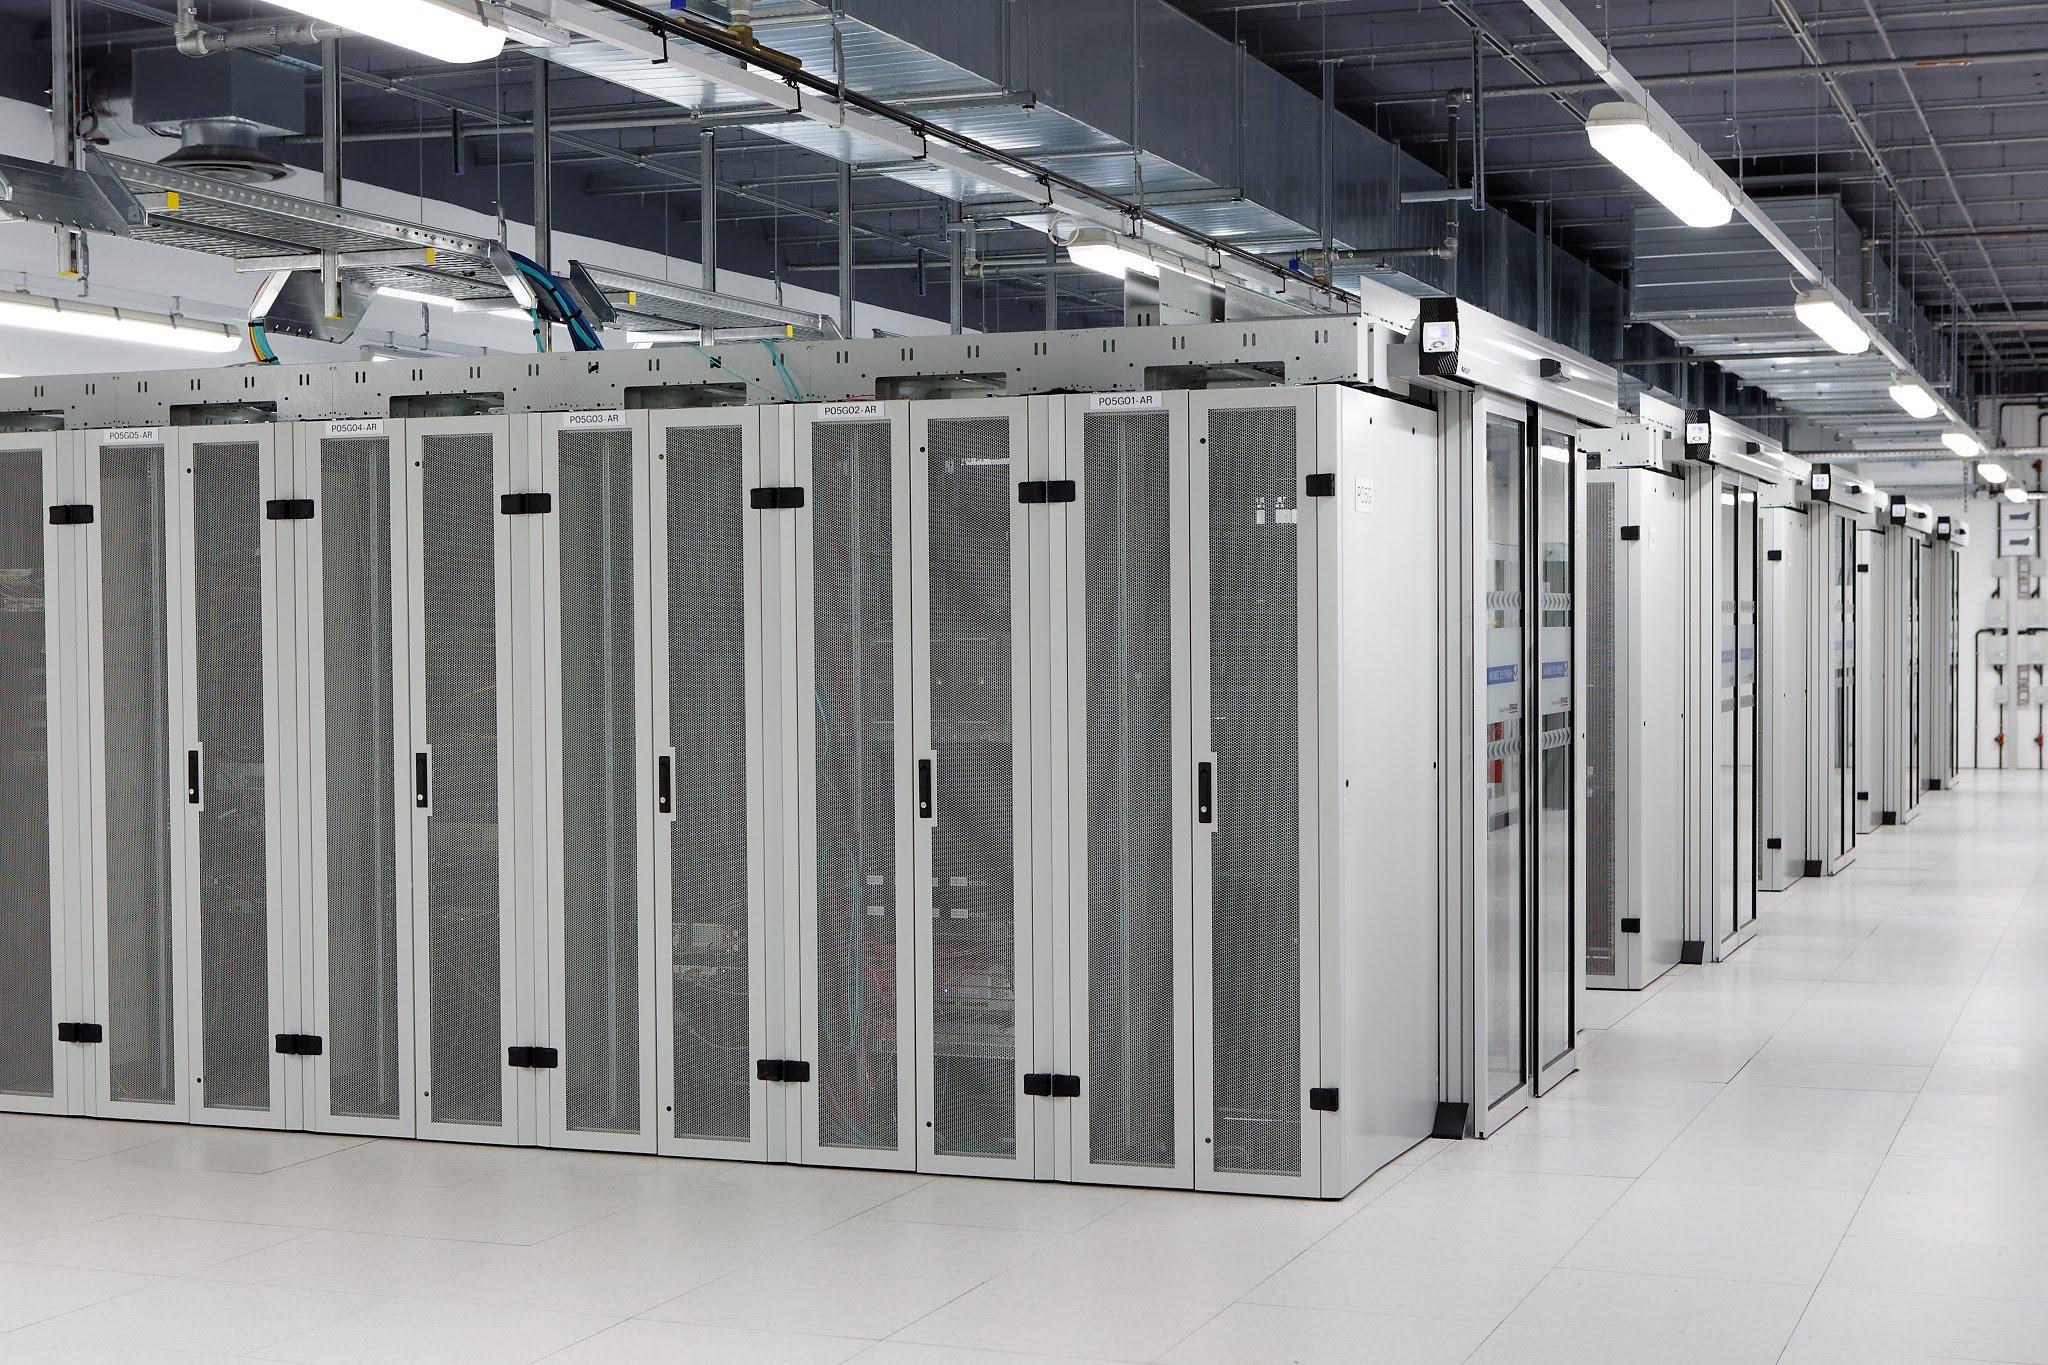 FZ9A8207 DxO - Paris opens a data center to control its digital infrastructure